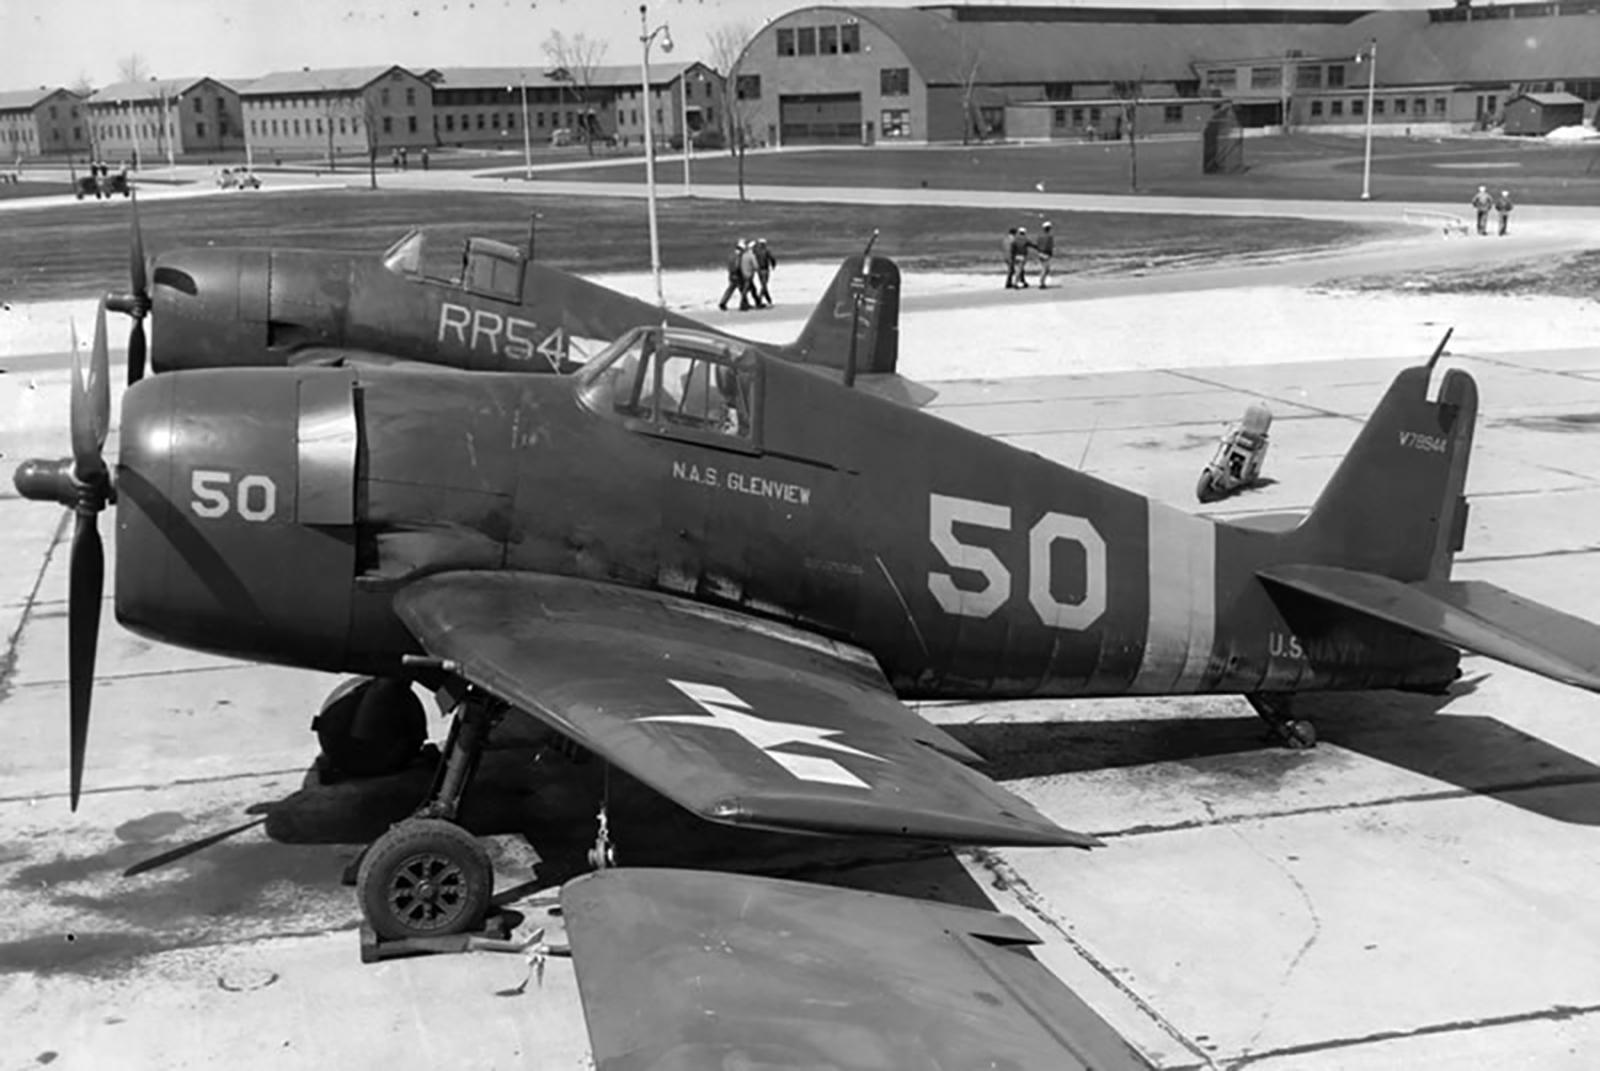 Grumman F6F 5 Hellcat NAS Yellow 50 NAS Glenview 01